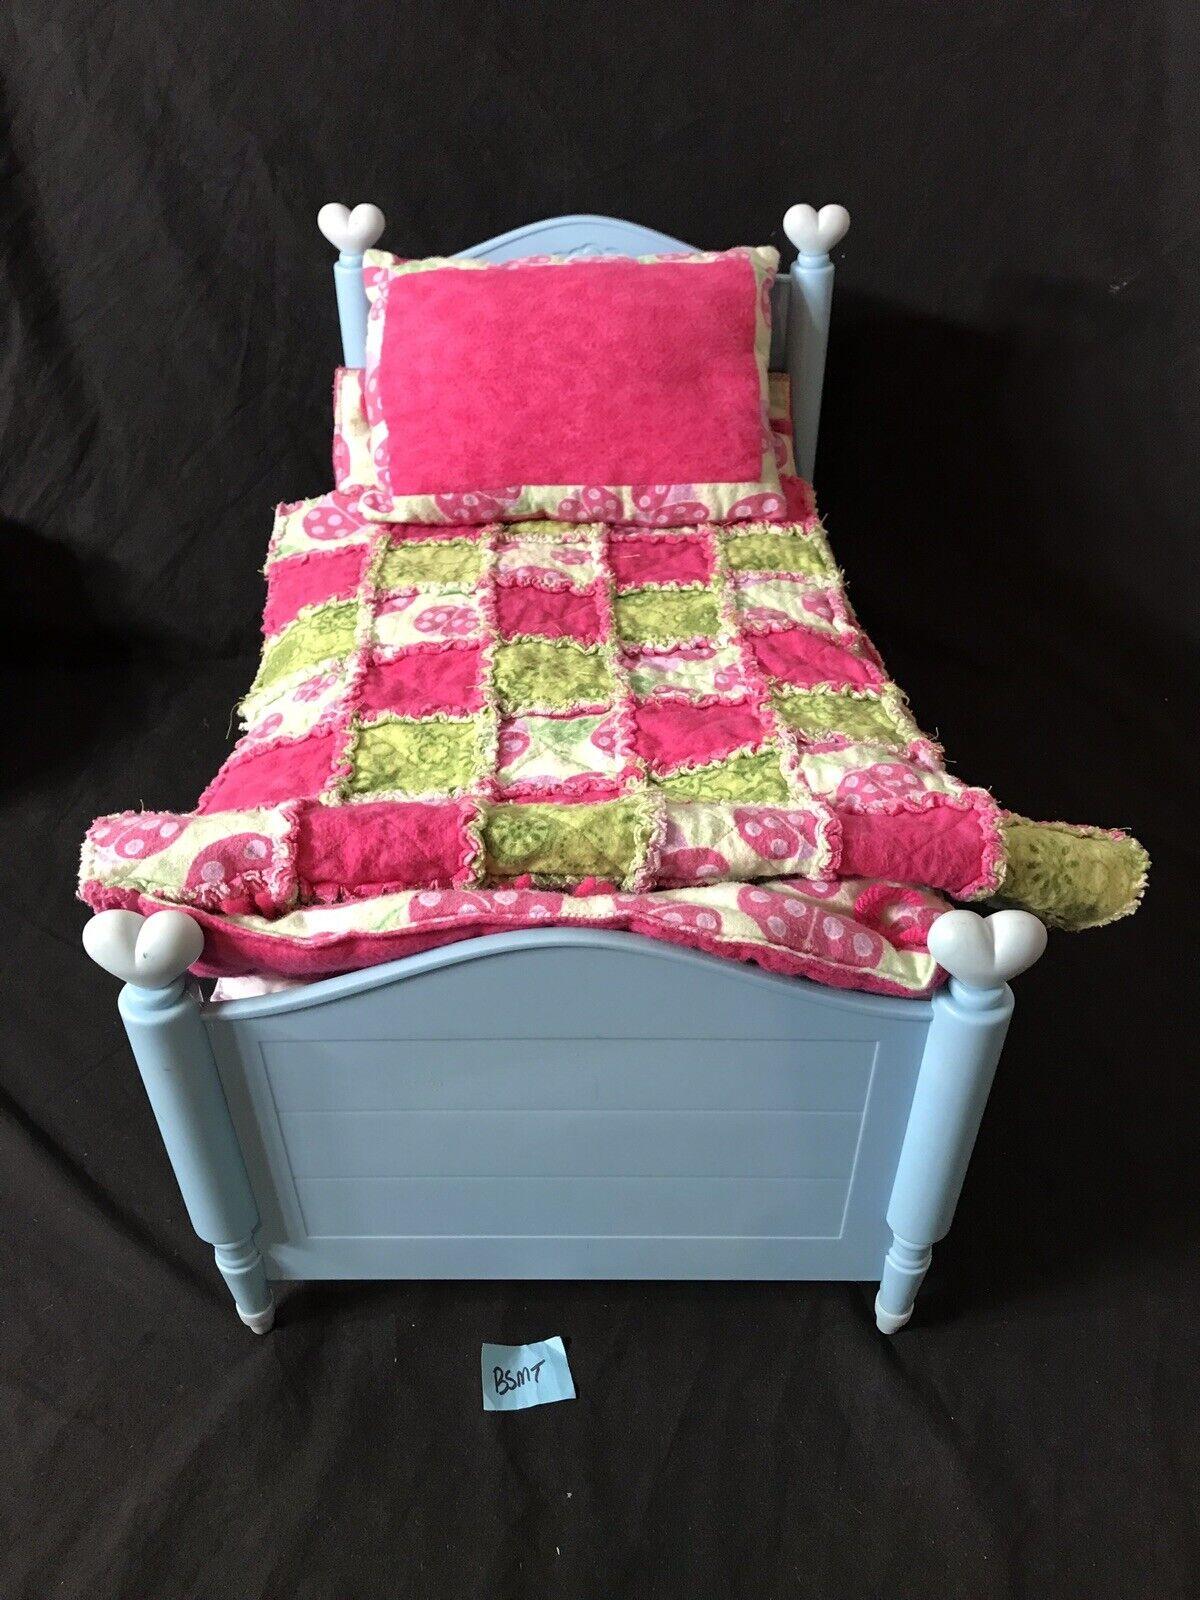 American girl girl girl doll bitty baby retirot Blau heart bed And Bedding Set 8357a6